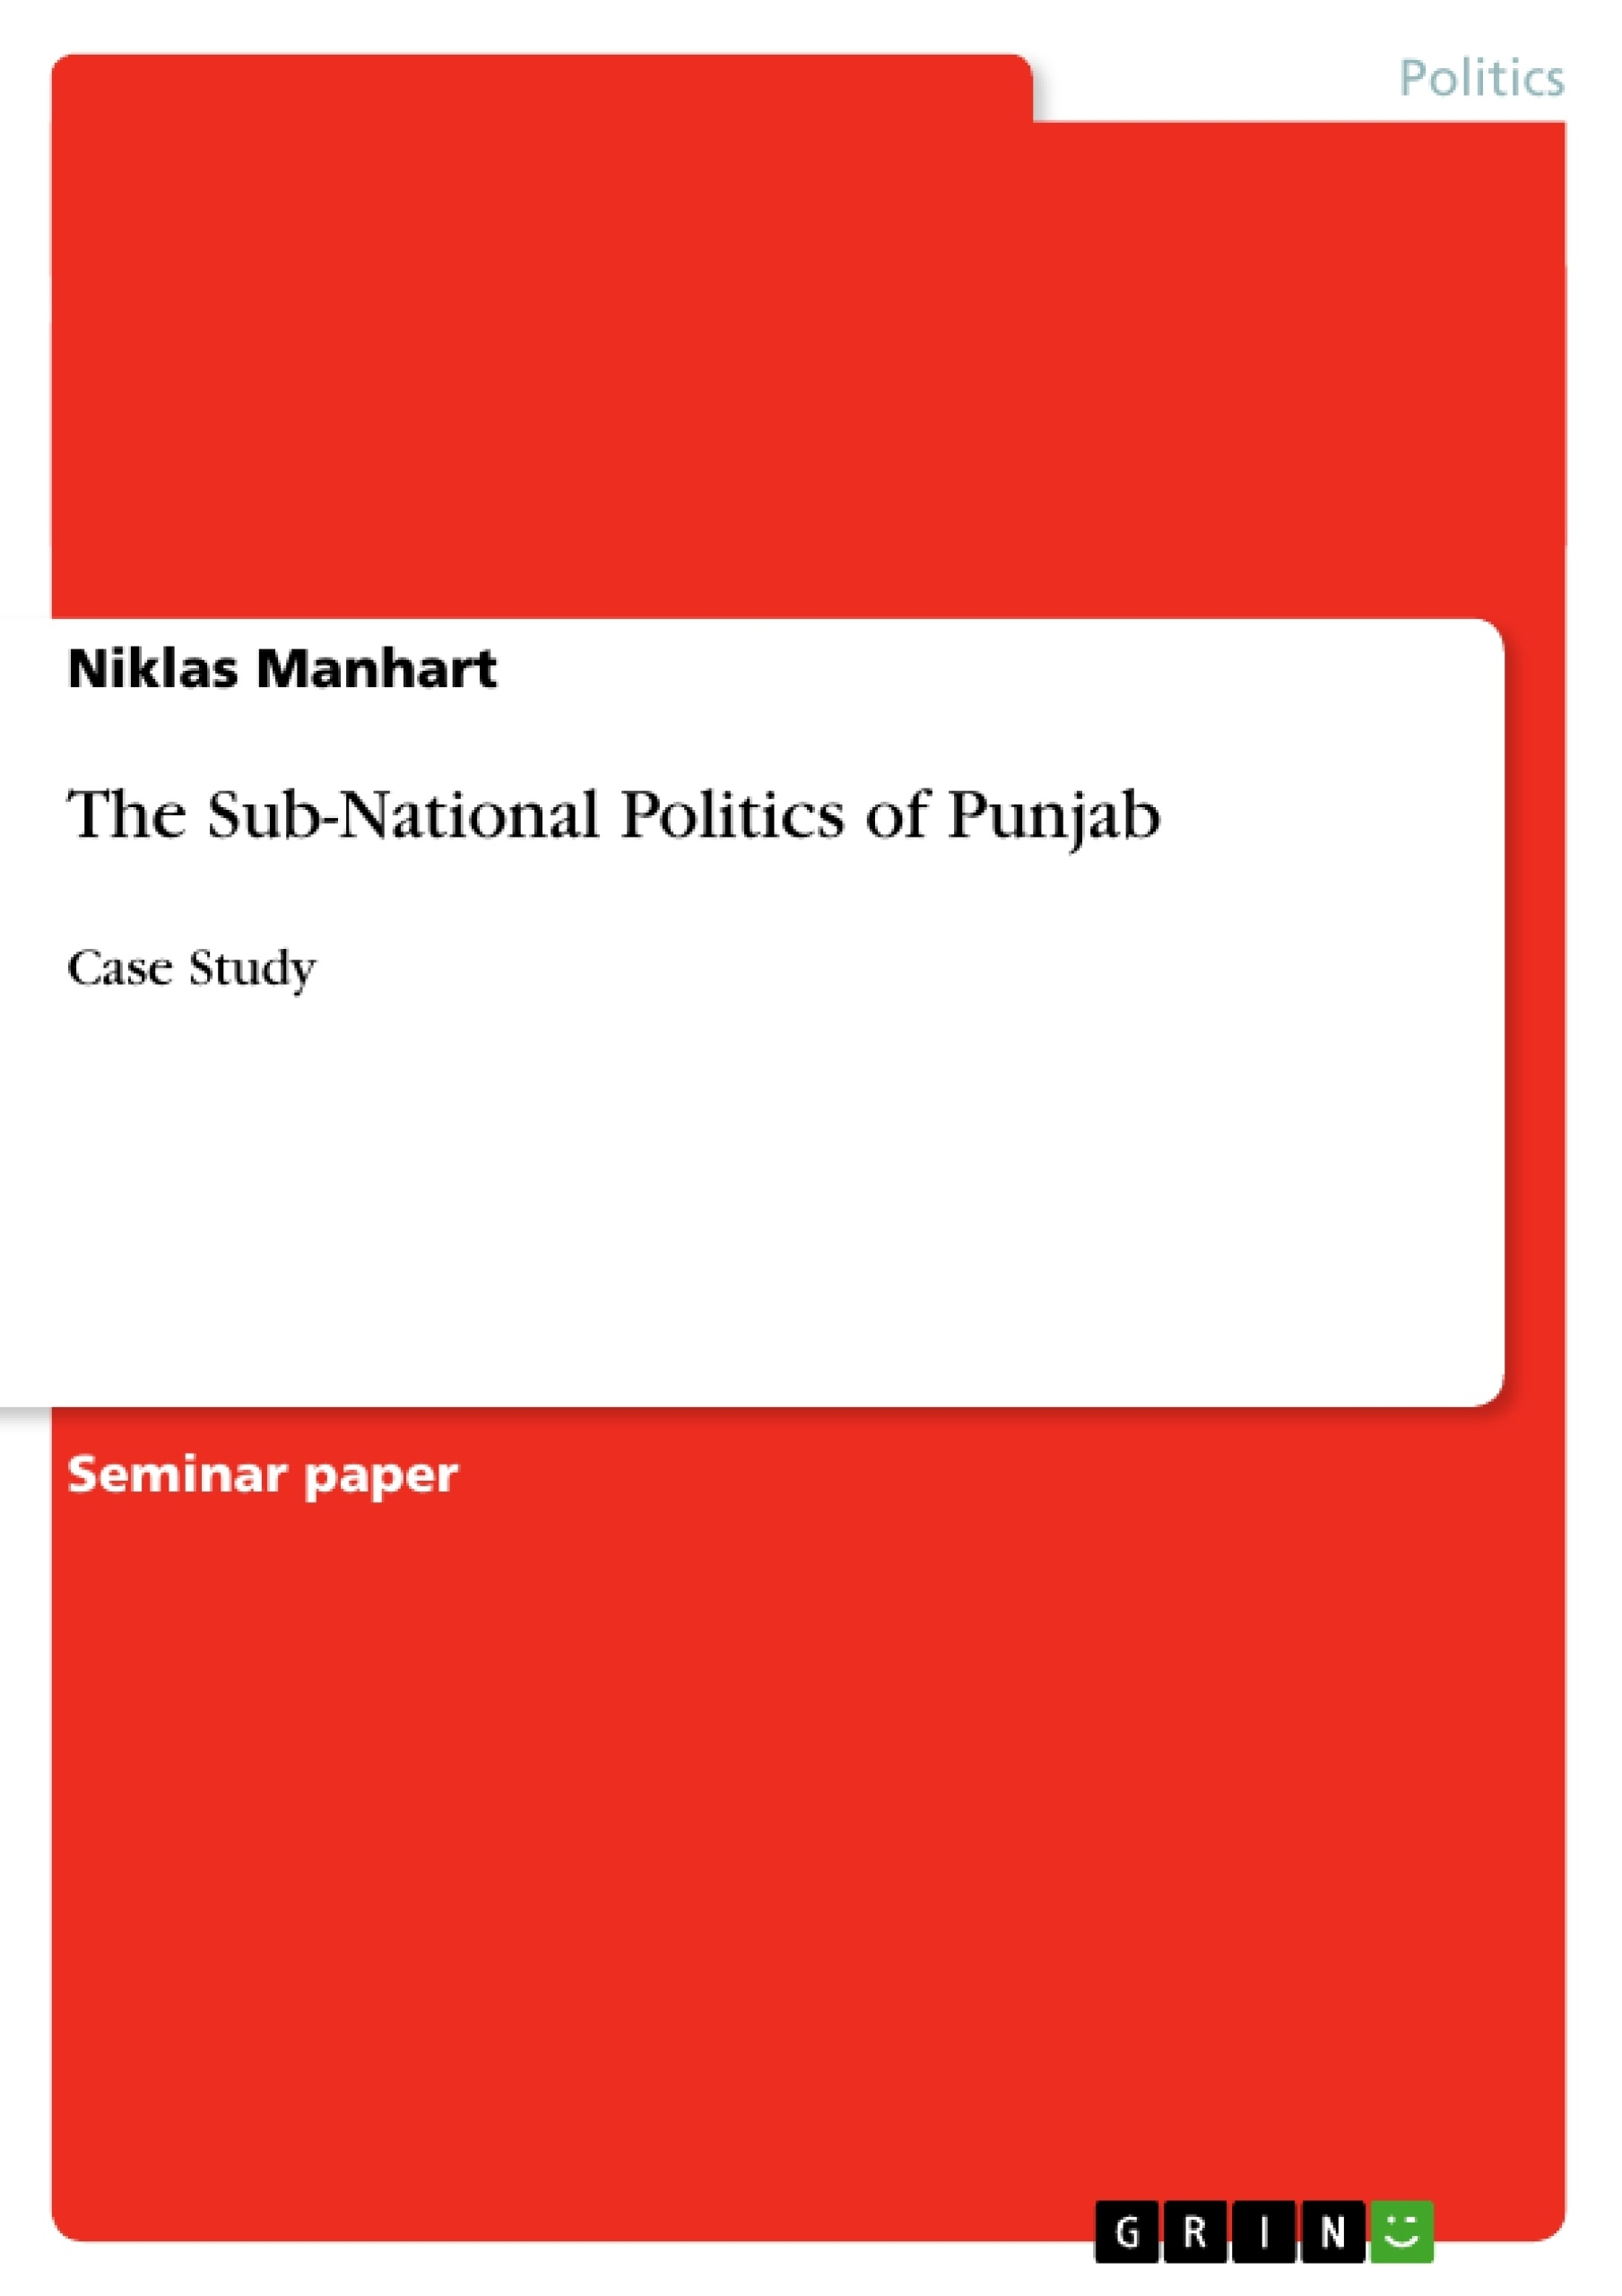 GRIN - The Sub-National Politics of Punjab